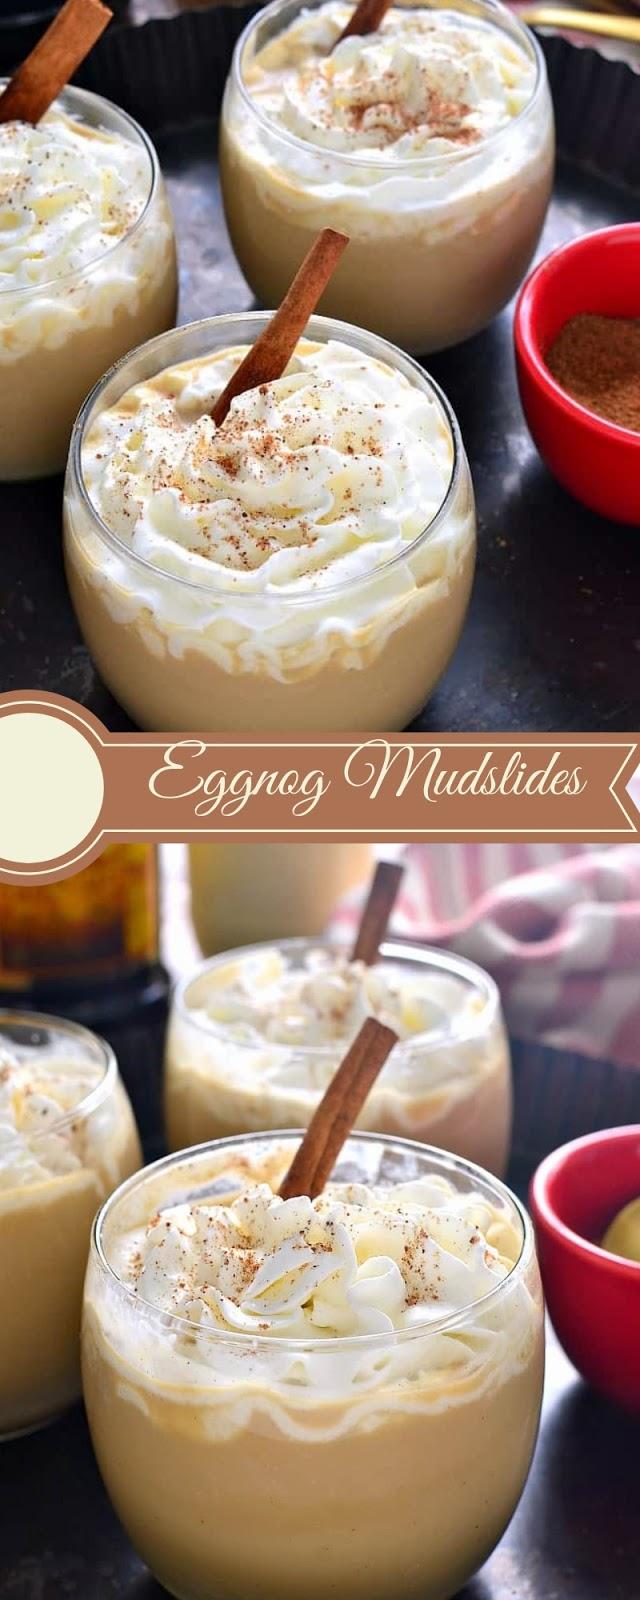 Eggnog Mudslides